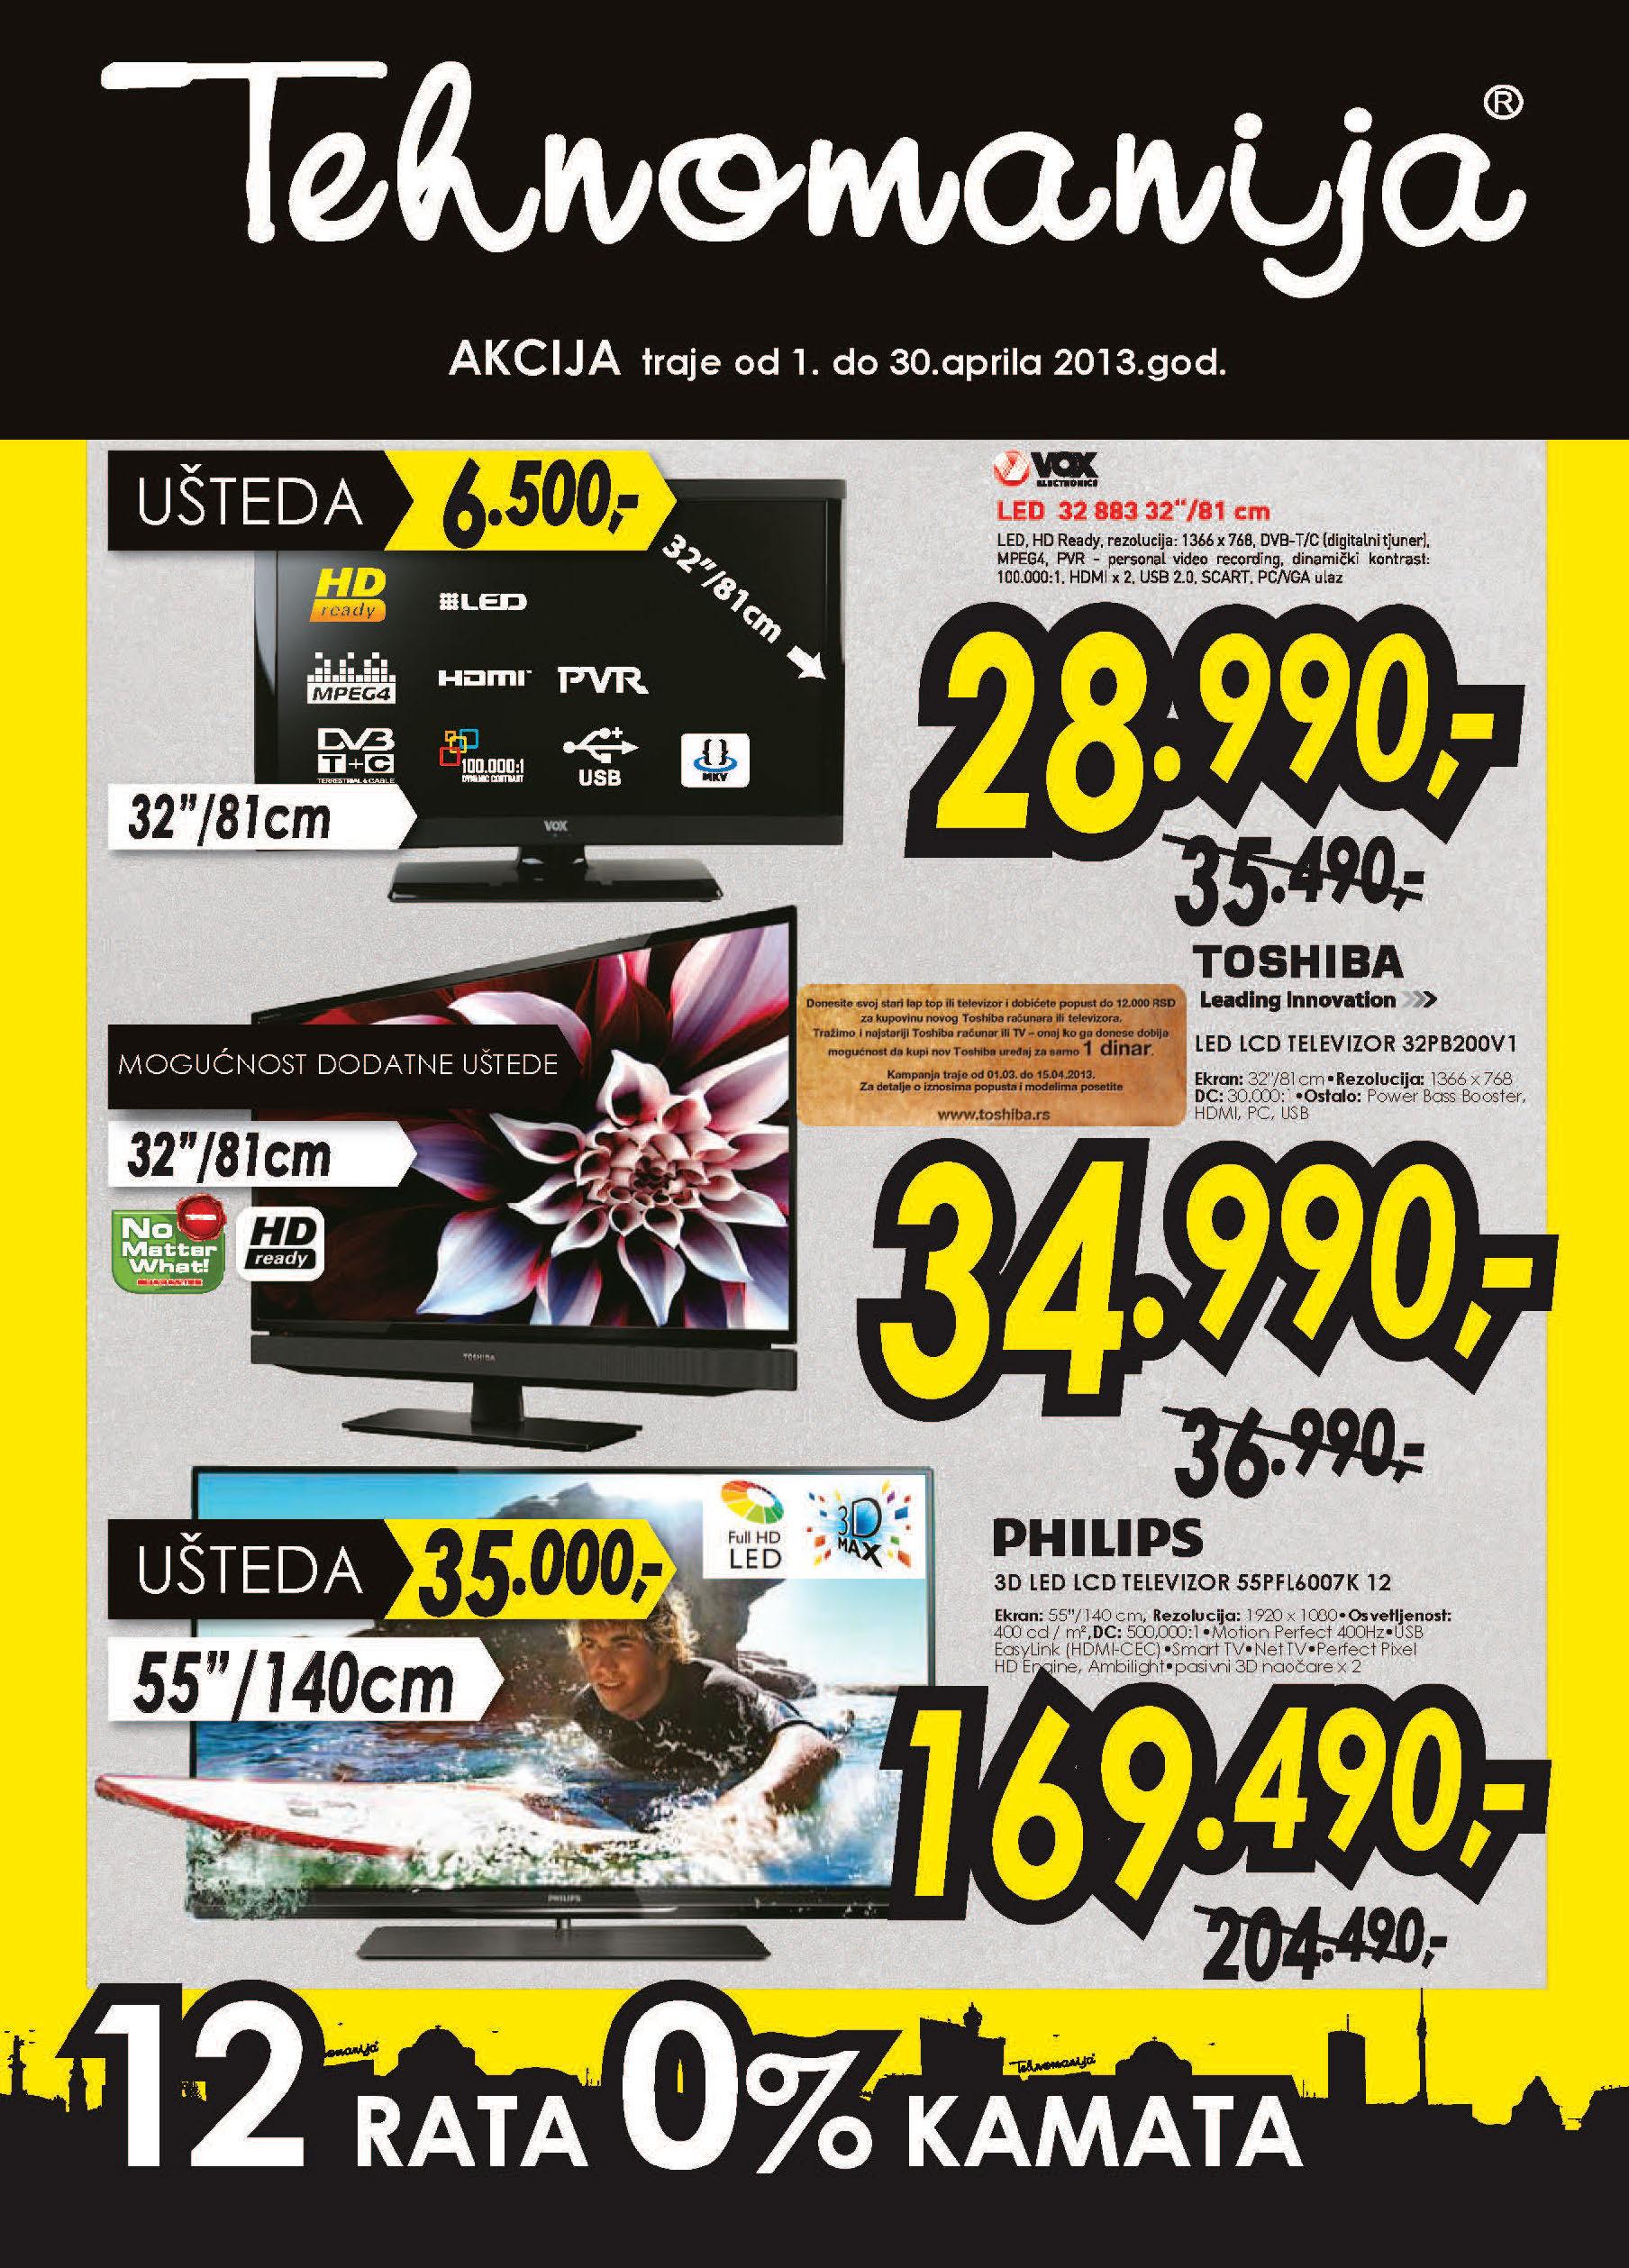 Tehnomanija Katalog televizori